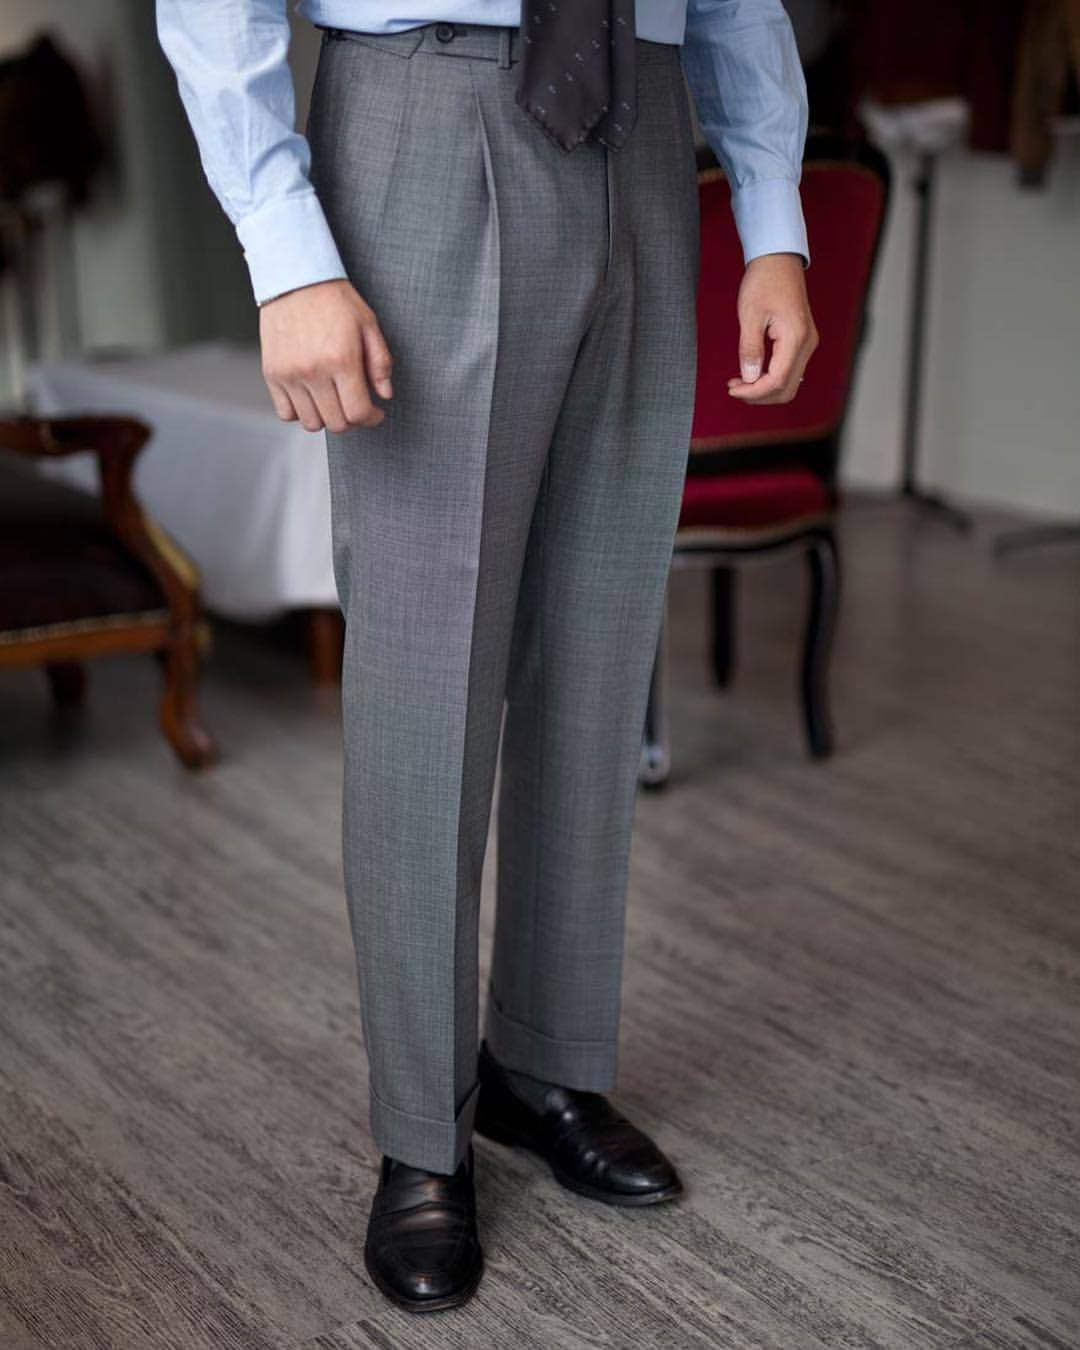 Voilà un pantalon qui pend. Source : Spalla Korea.